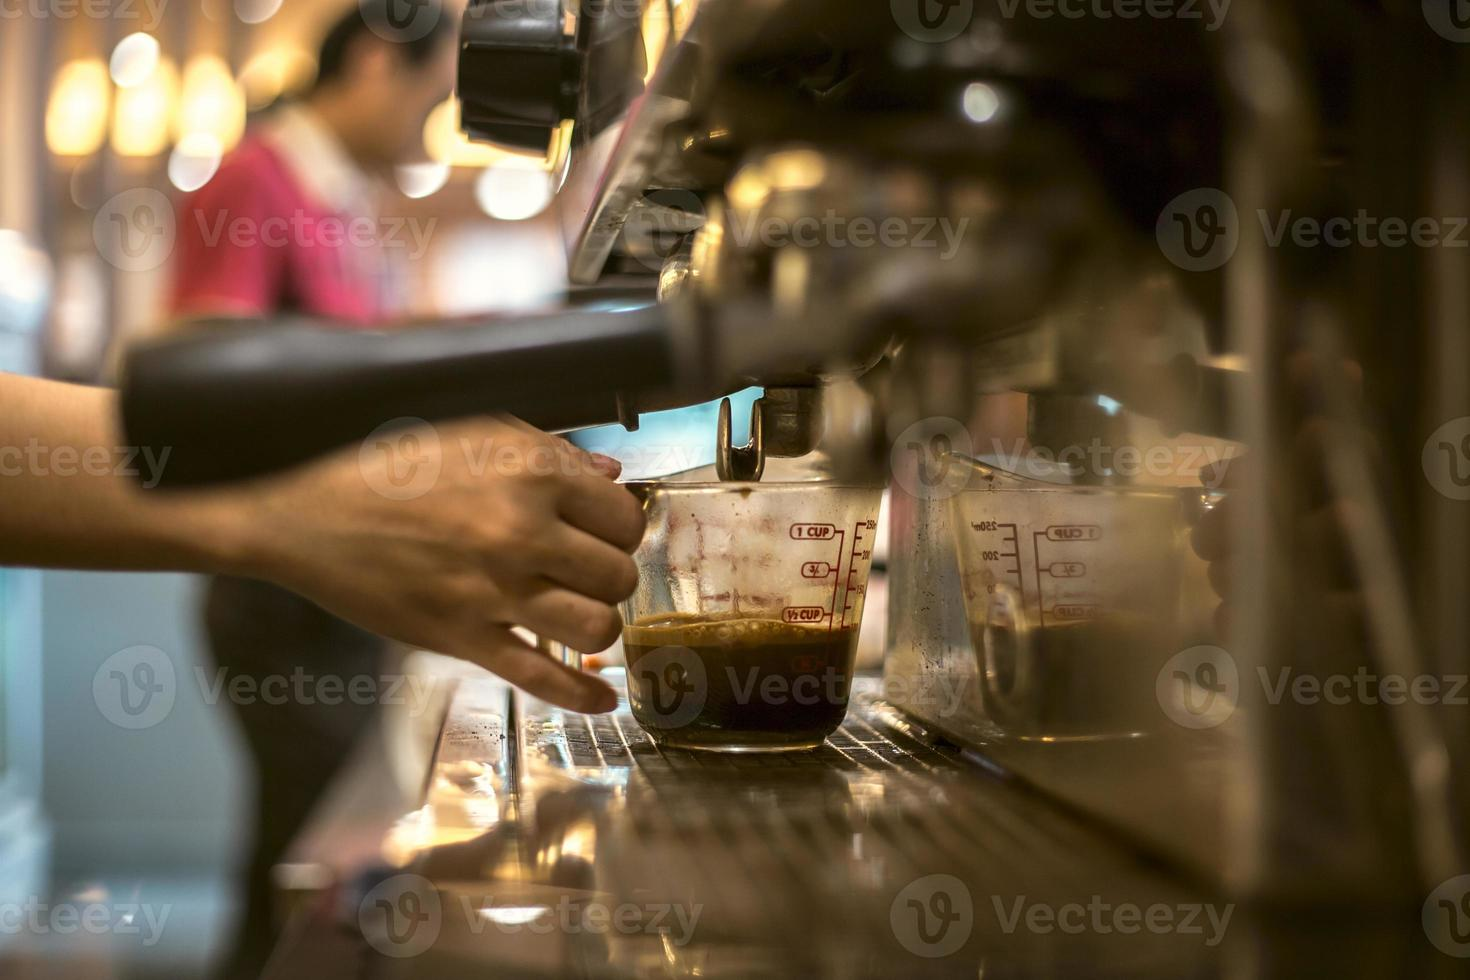 koffiezetapparaat, close-up foto